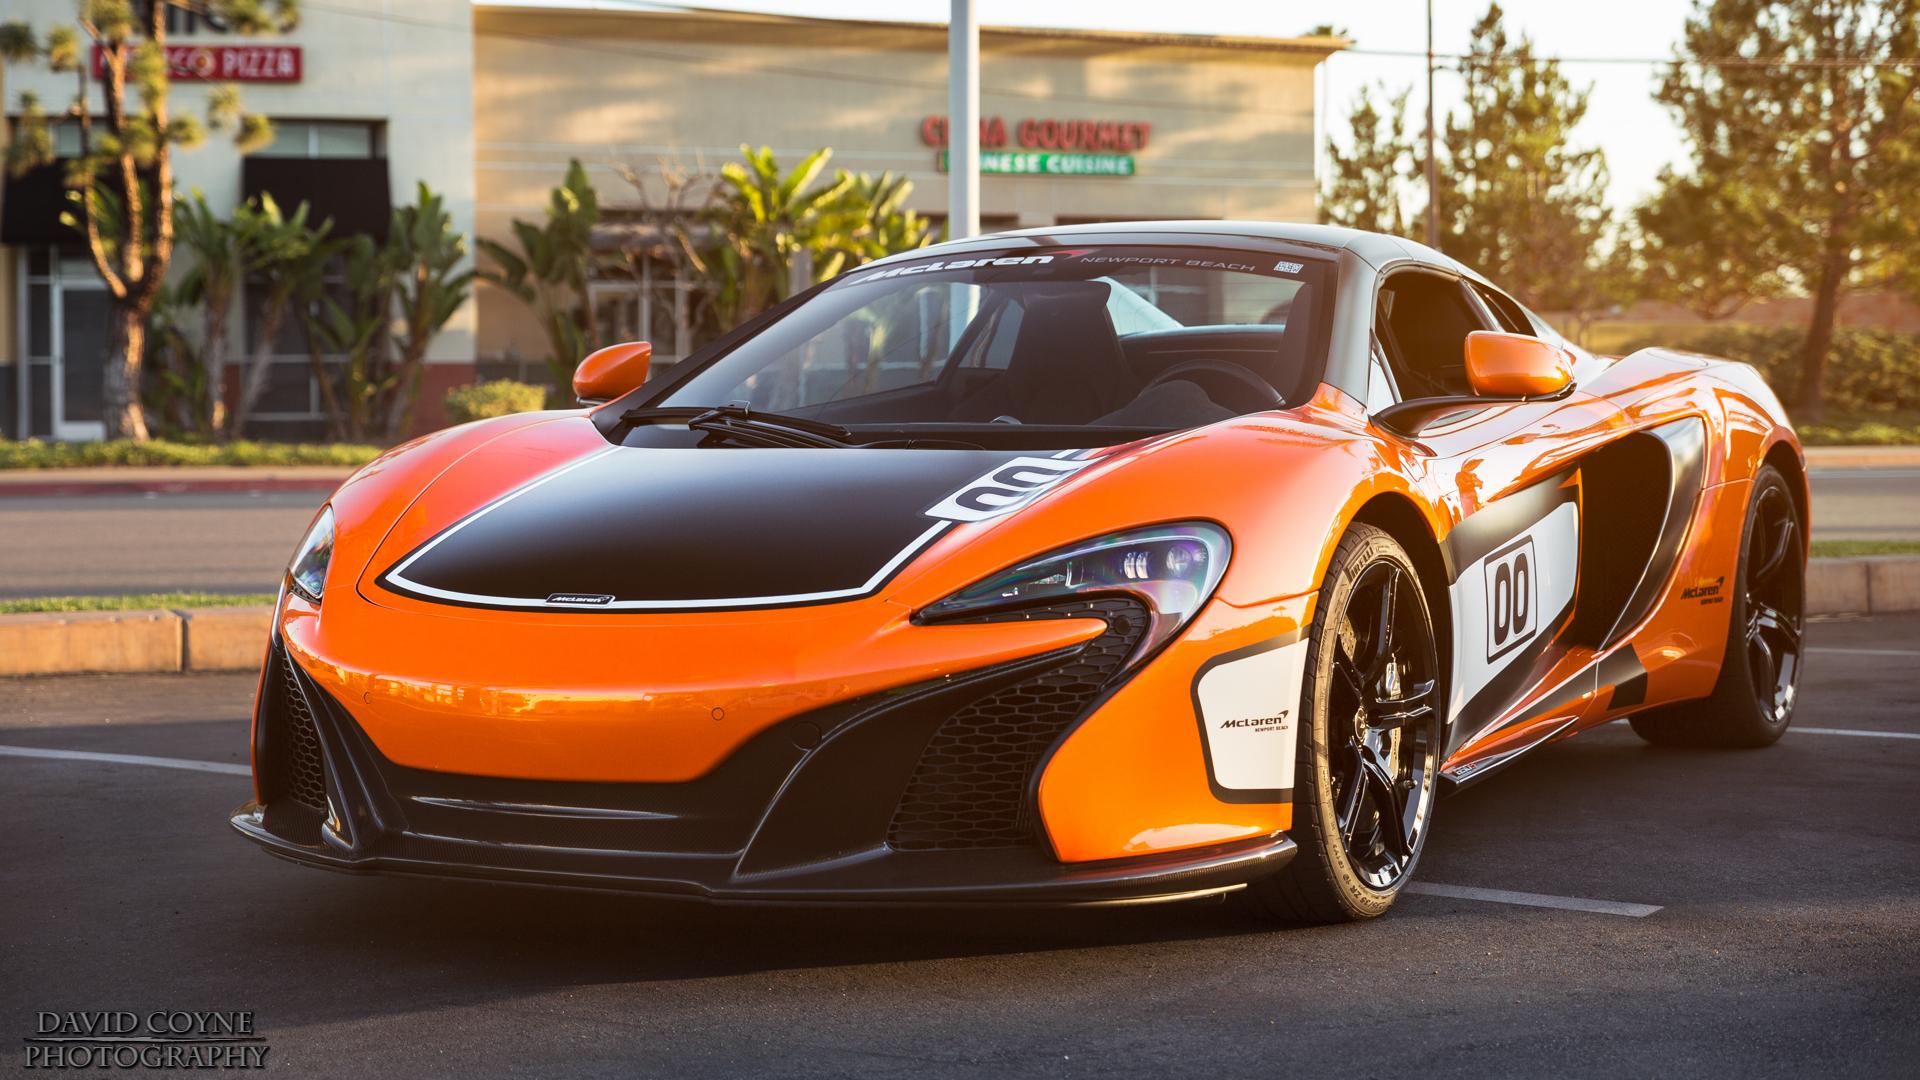 Sport Car Wallpaper Tumblr: Wallpaper : Supercars, Canon, Orange, California, British